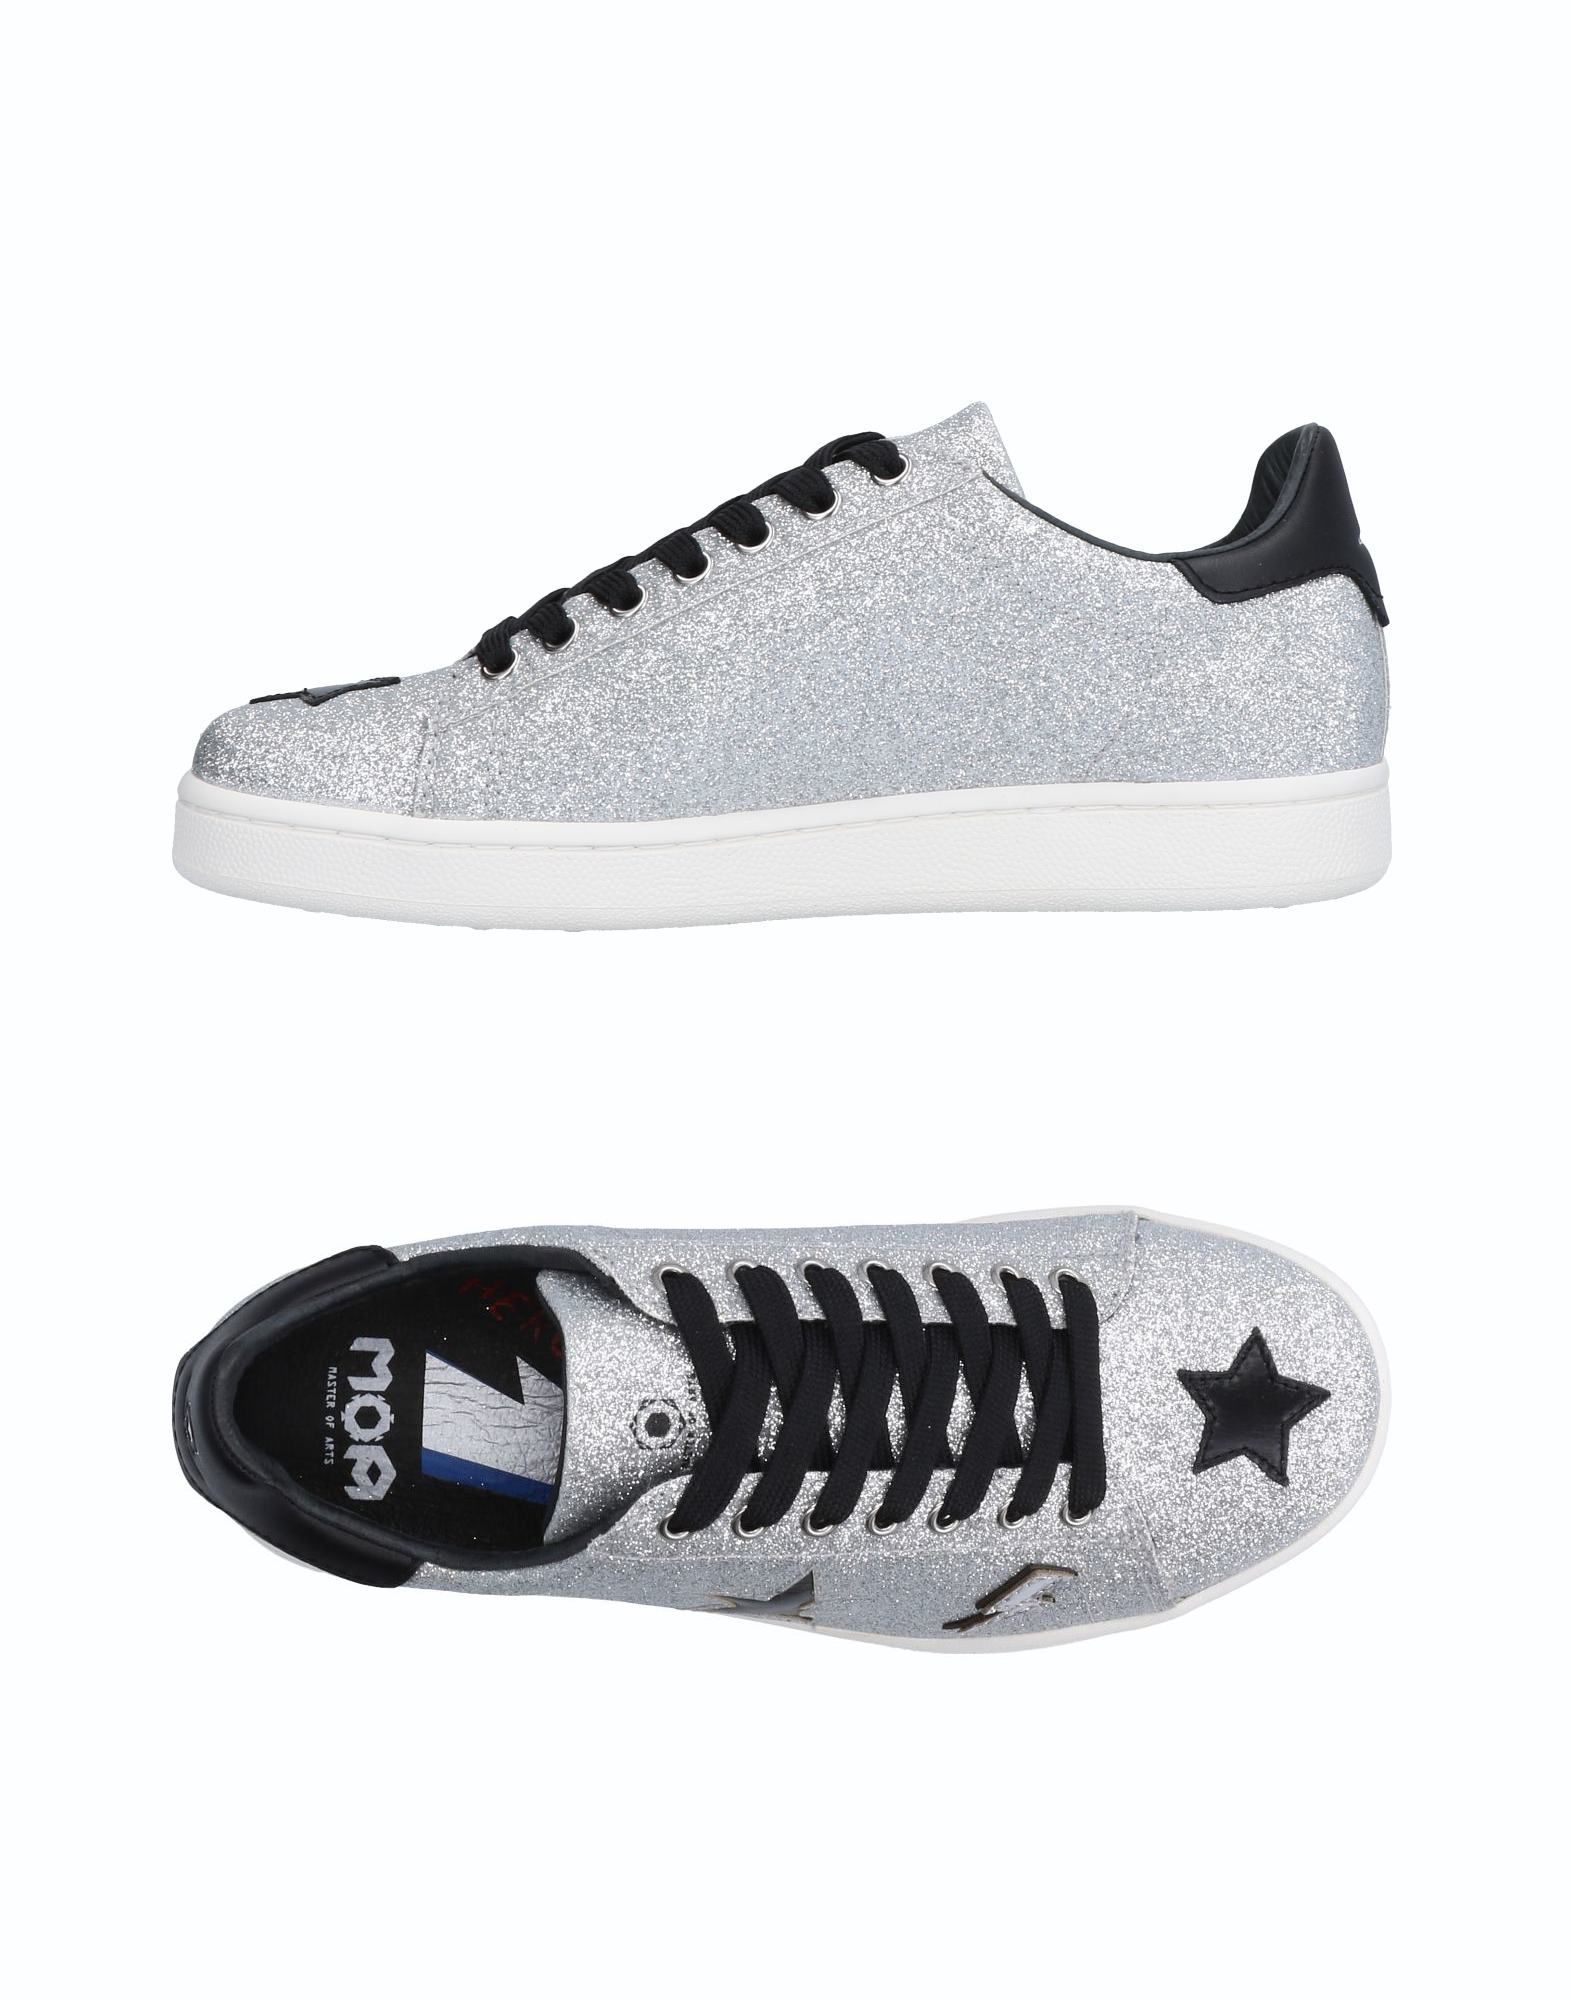 Sneakers Moa Arts Master Of Arts Moa Donna - 11509130QJ ce9f8d